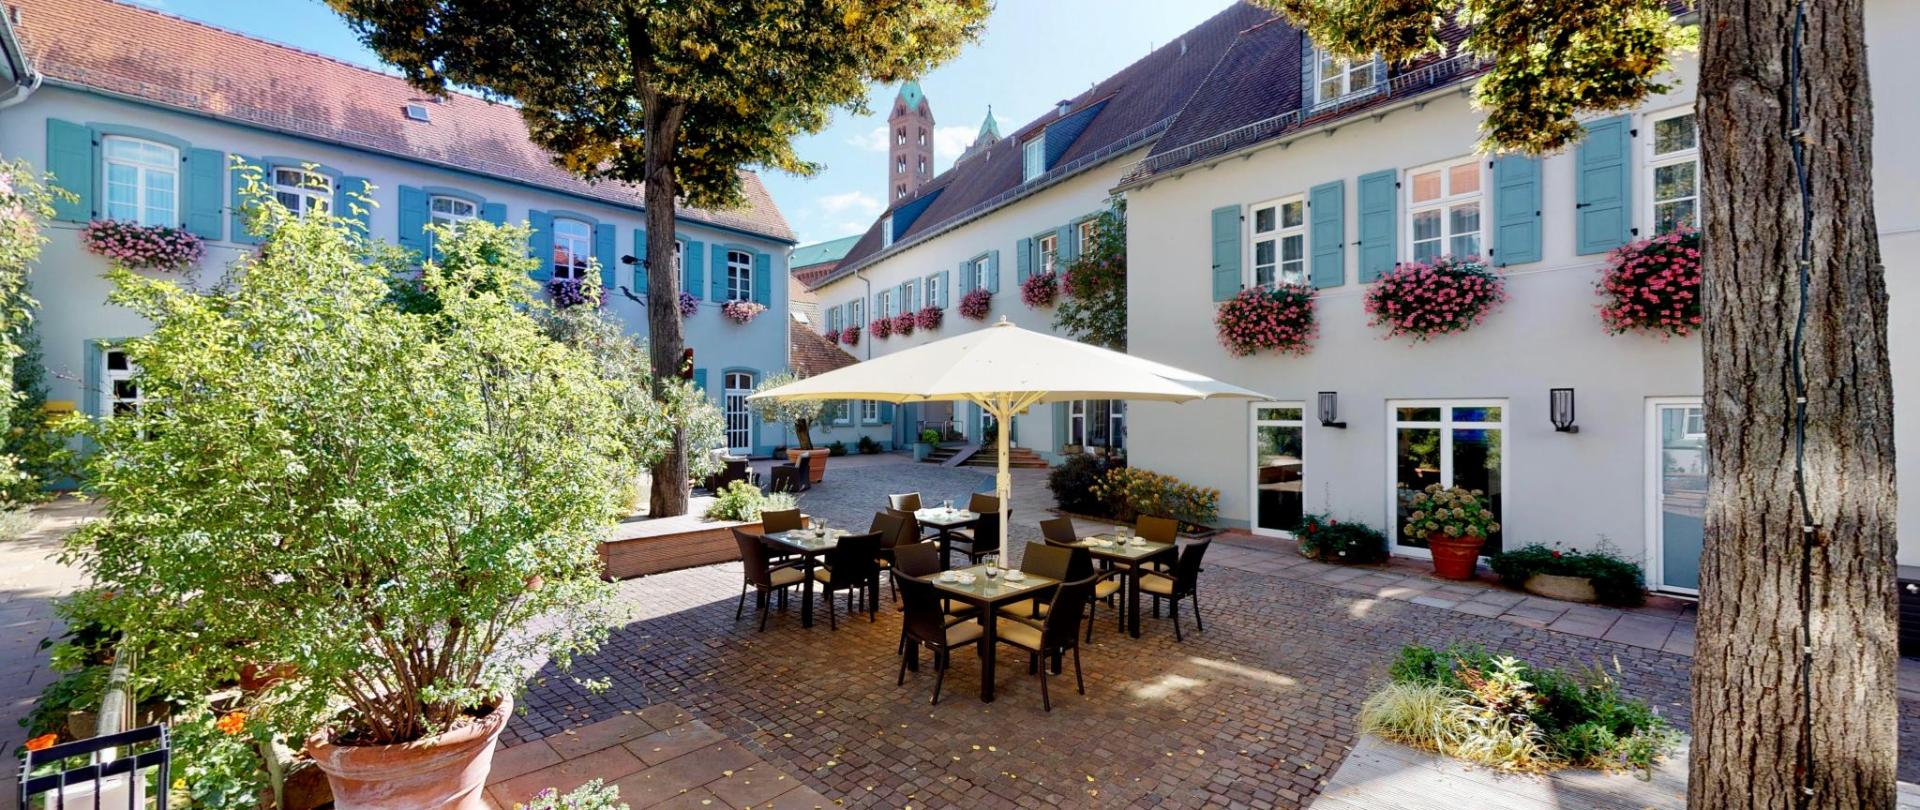 Hotel-Domhof-175017.jpeg